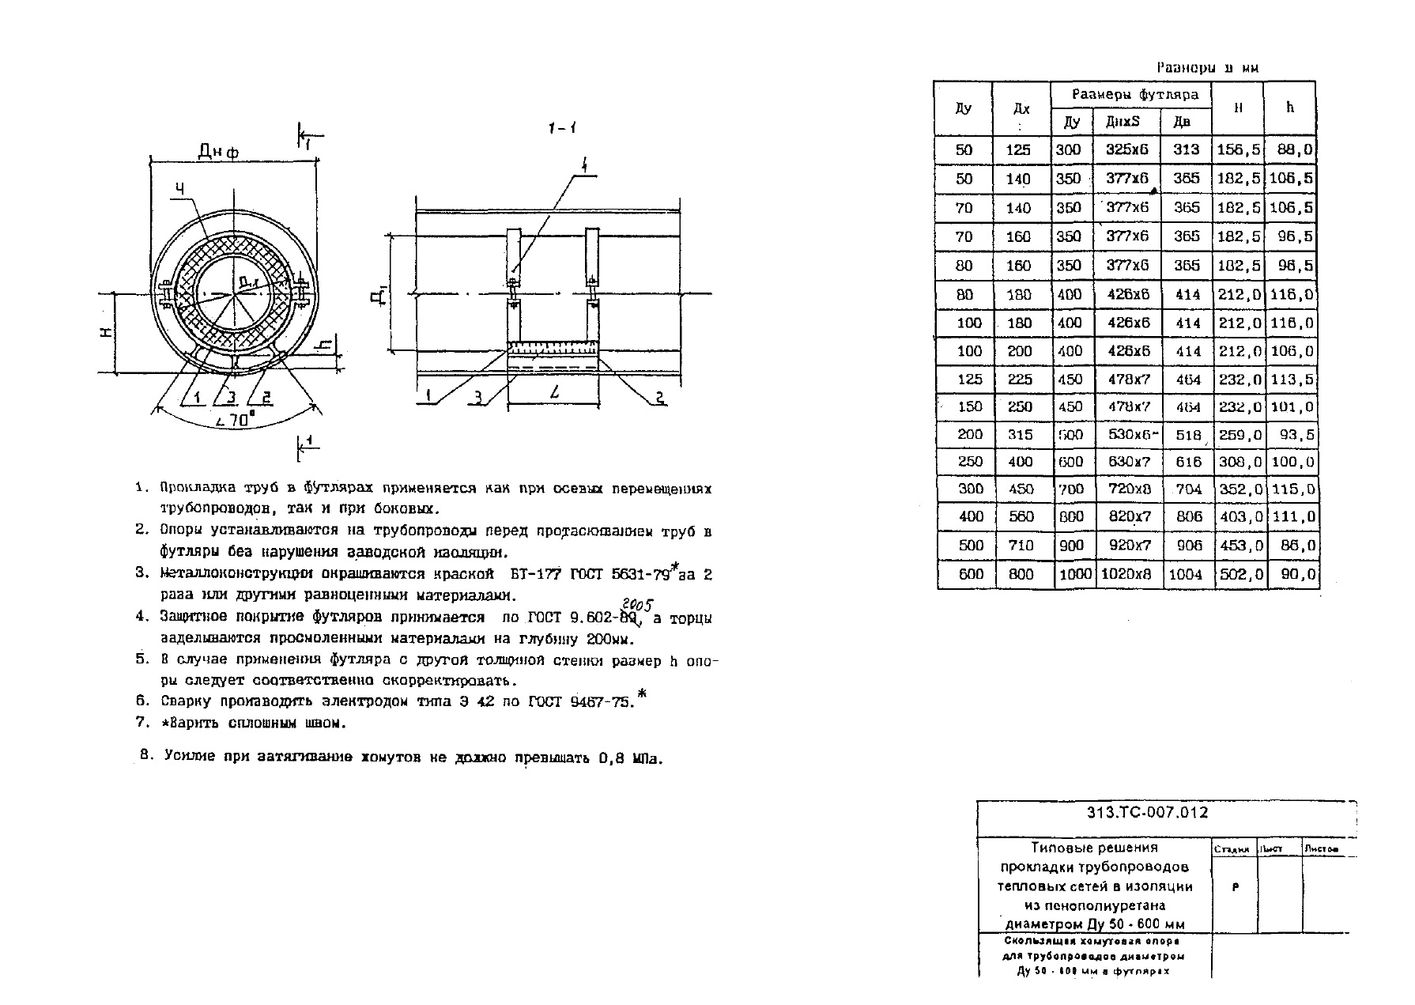 Скользящая хомутовая опора для трубопроводов Ду50-600 в футлярах 313.ТС-007.012